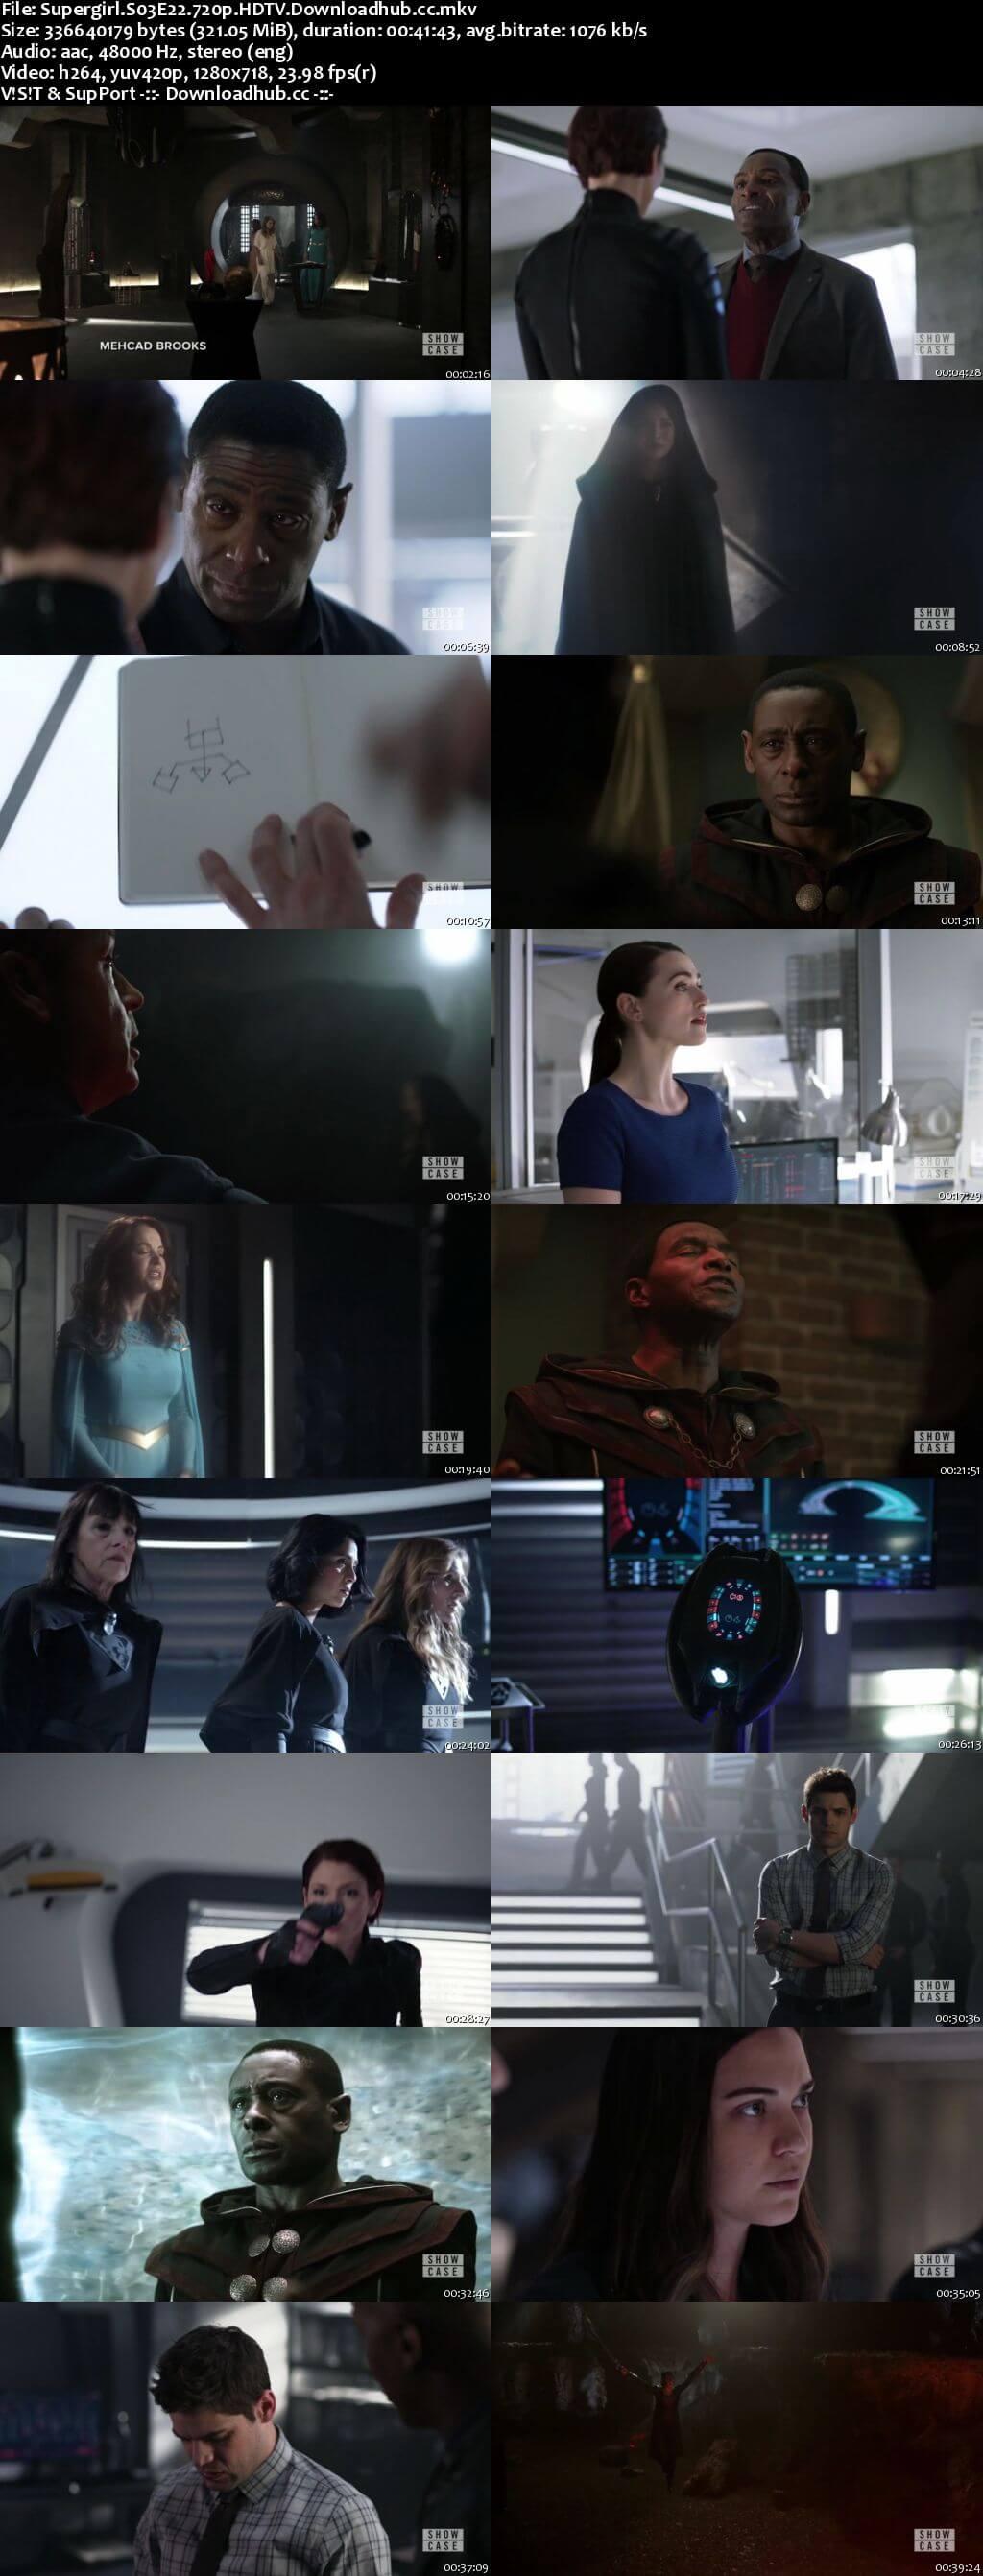 Supergirl S03E22 320MB HDTV 720p x264